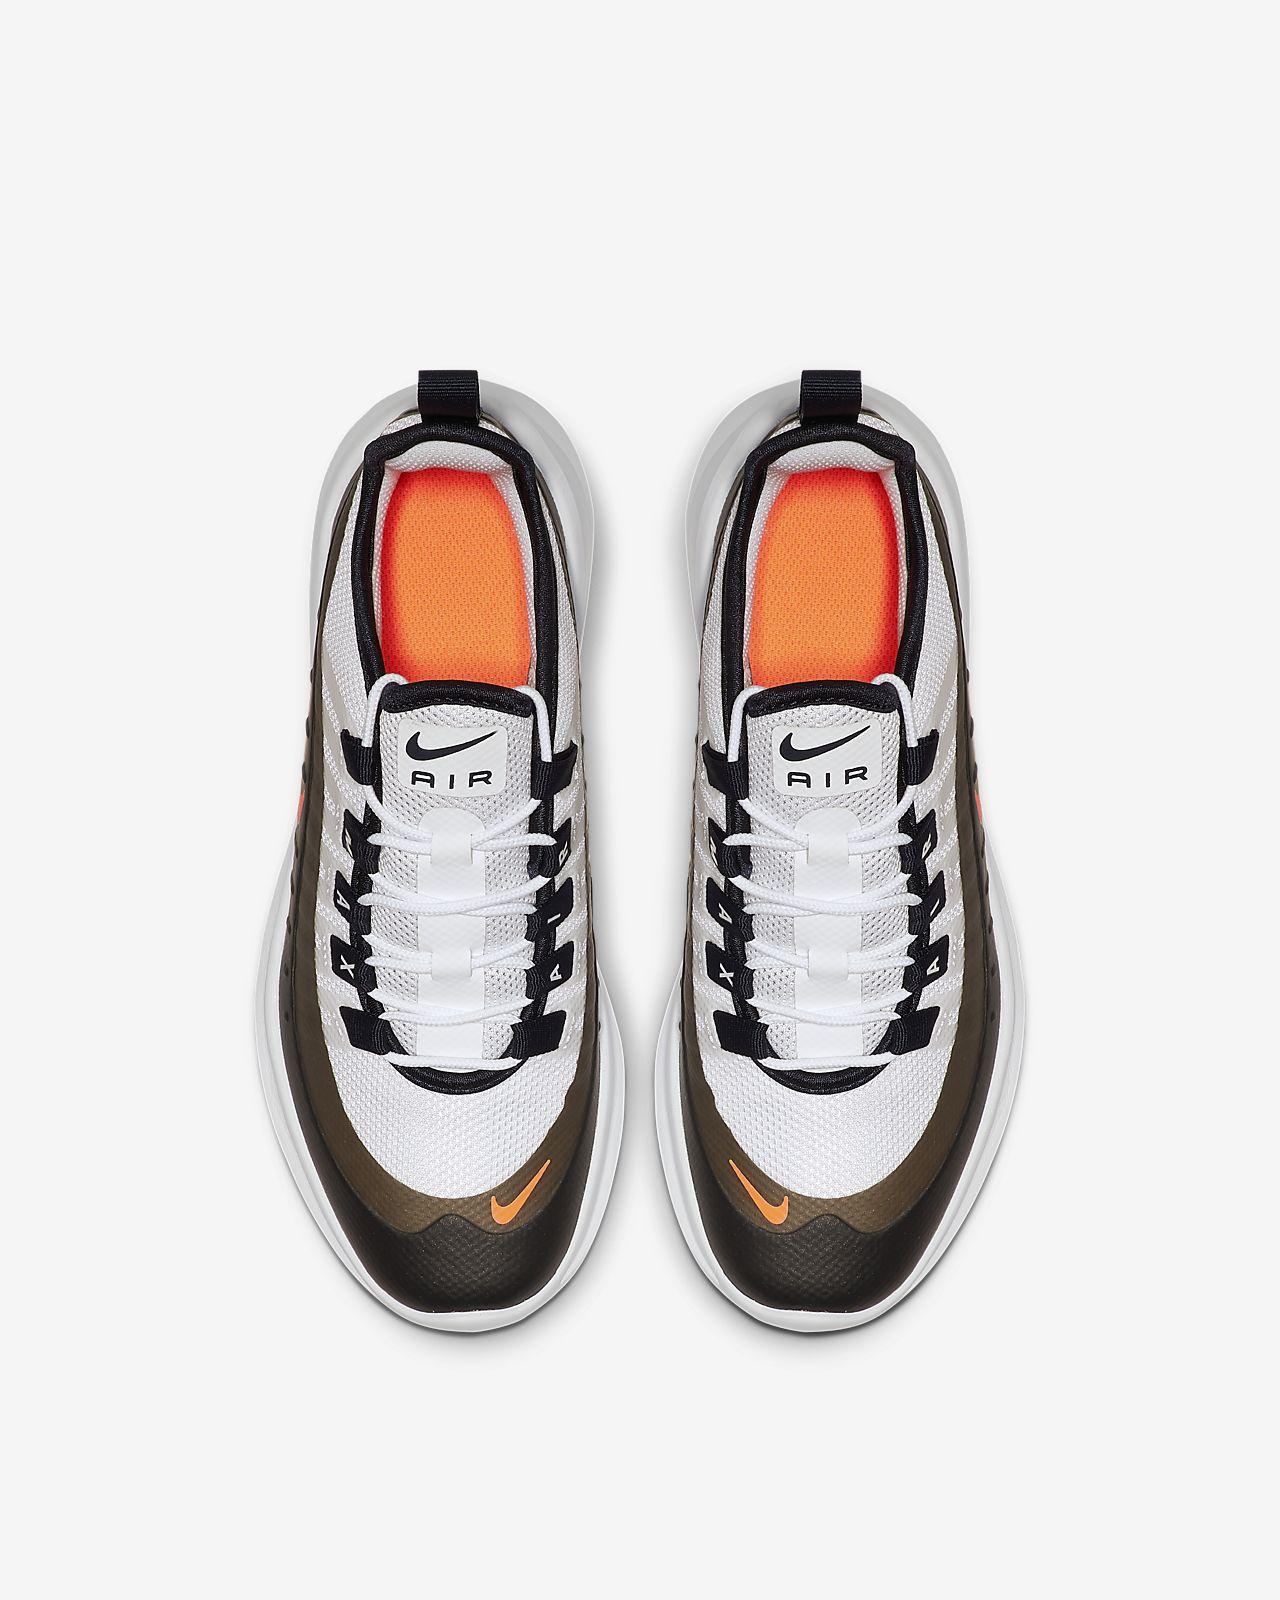 half off c1ceb b52f8 ... Chaussure Nike Air Max Axis pour Enfant plus âgé